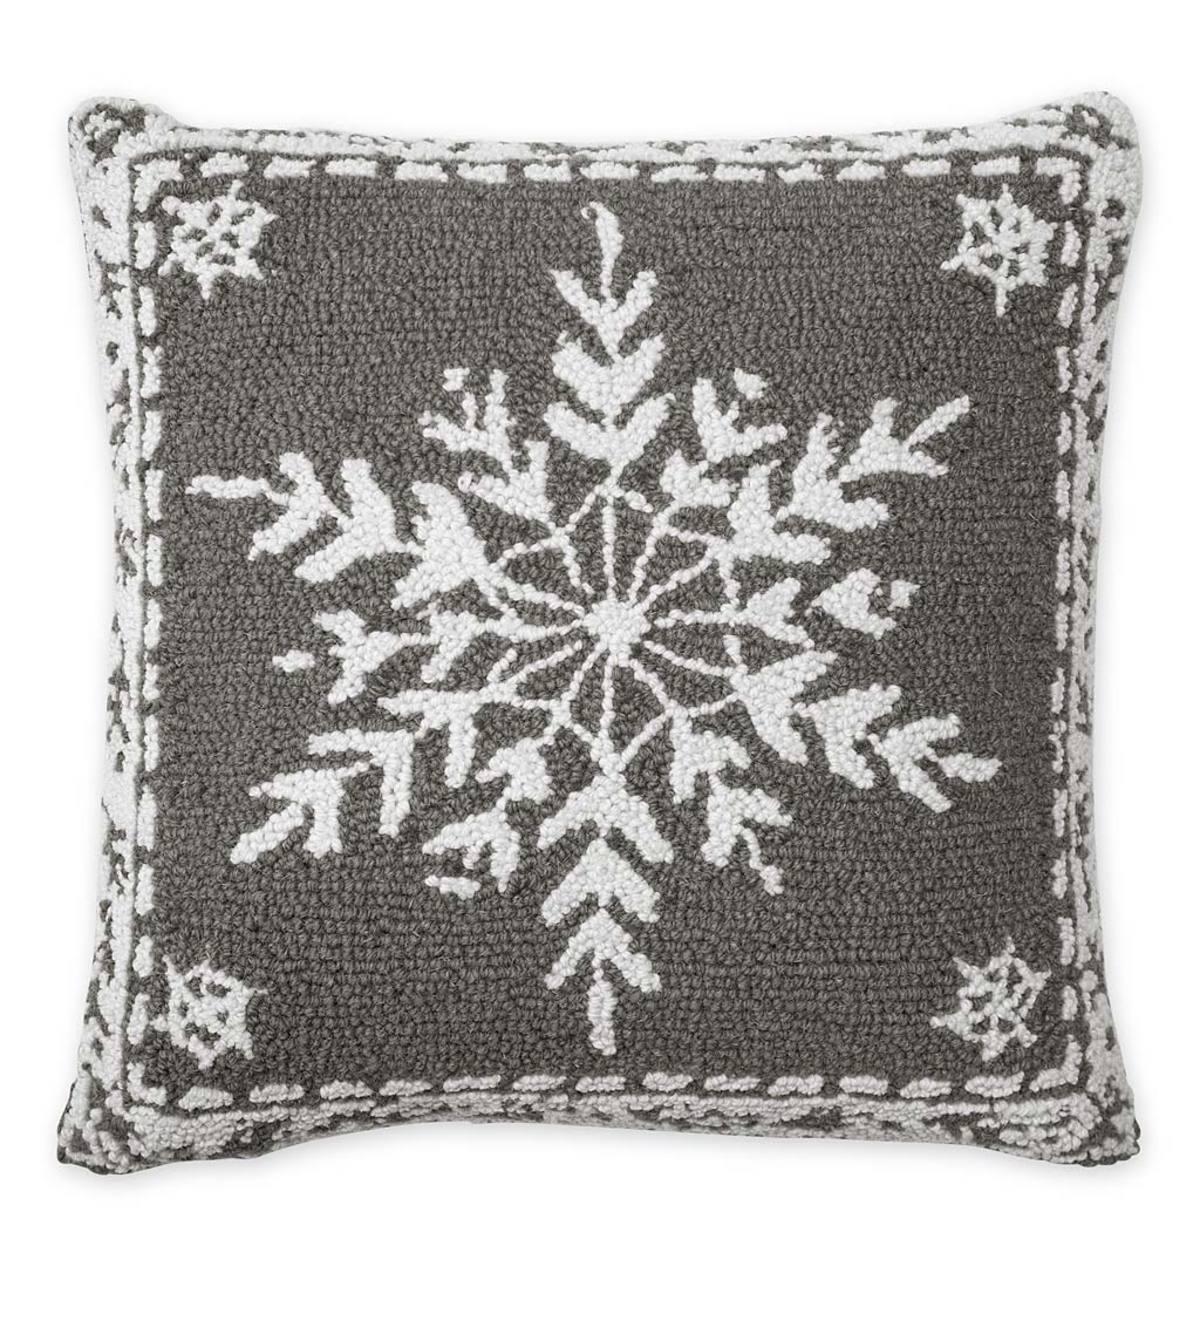 Hand Hooked Wool Holiday Snowflake Throw Pillow Plowhearth